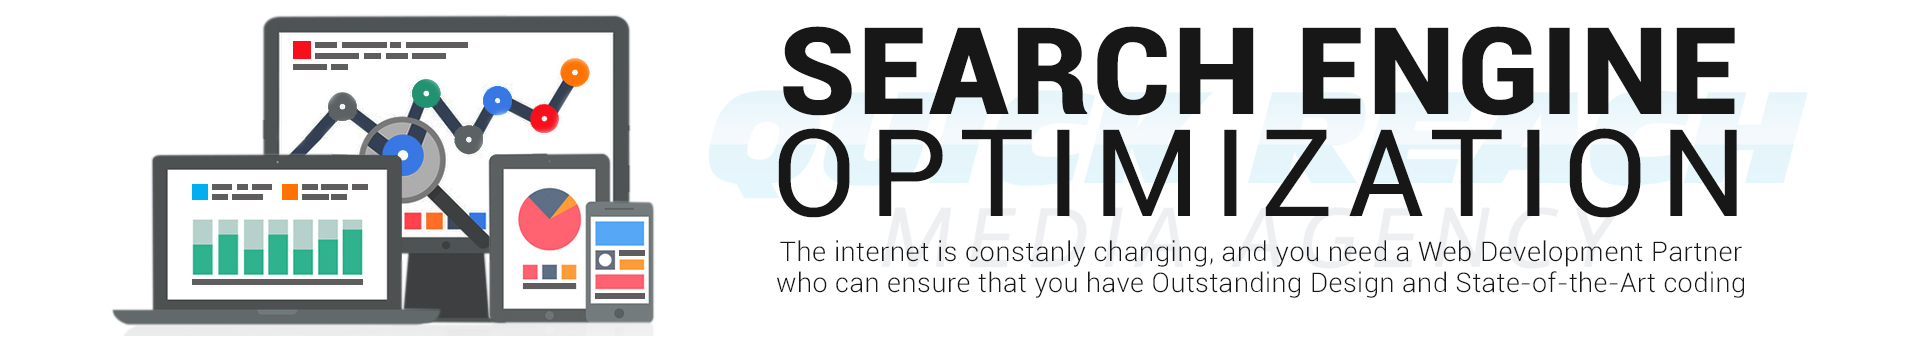 Search Engine Optimization - SEO Services